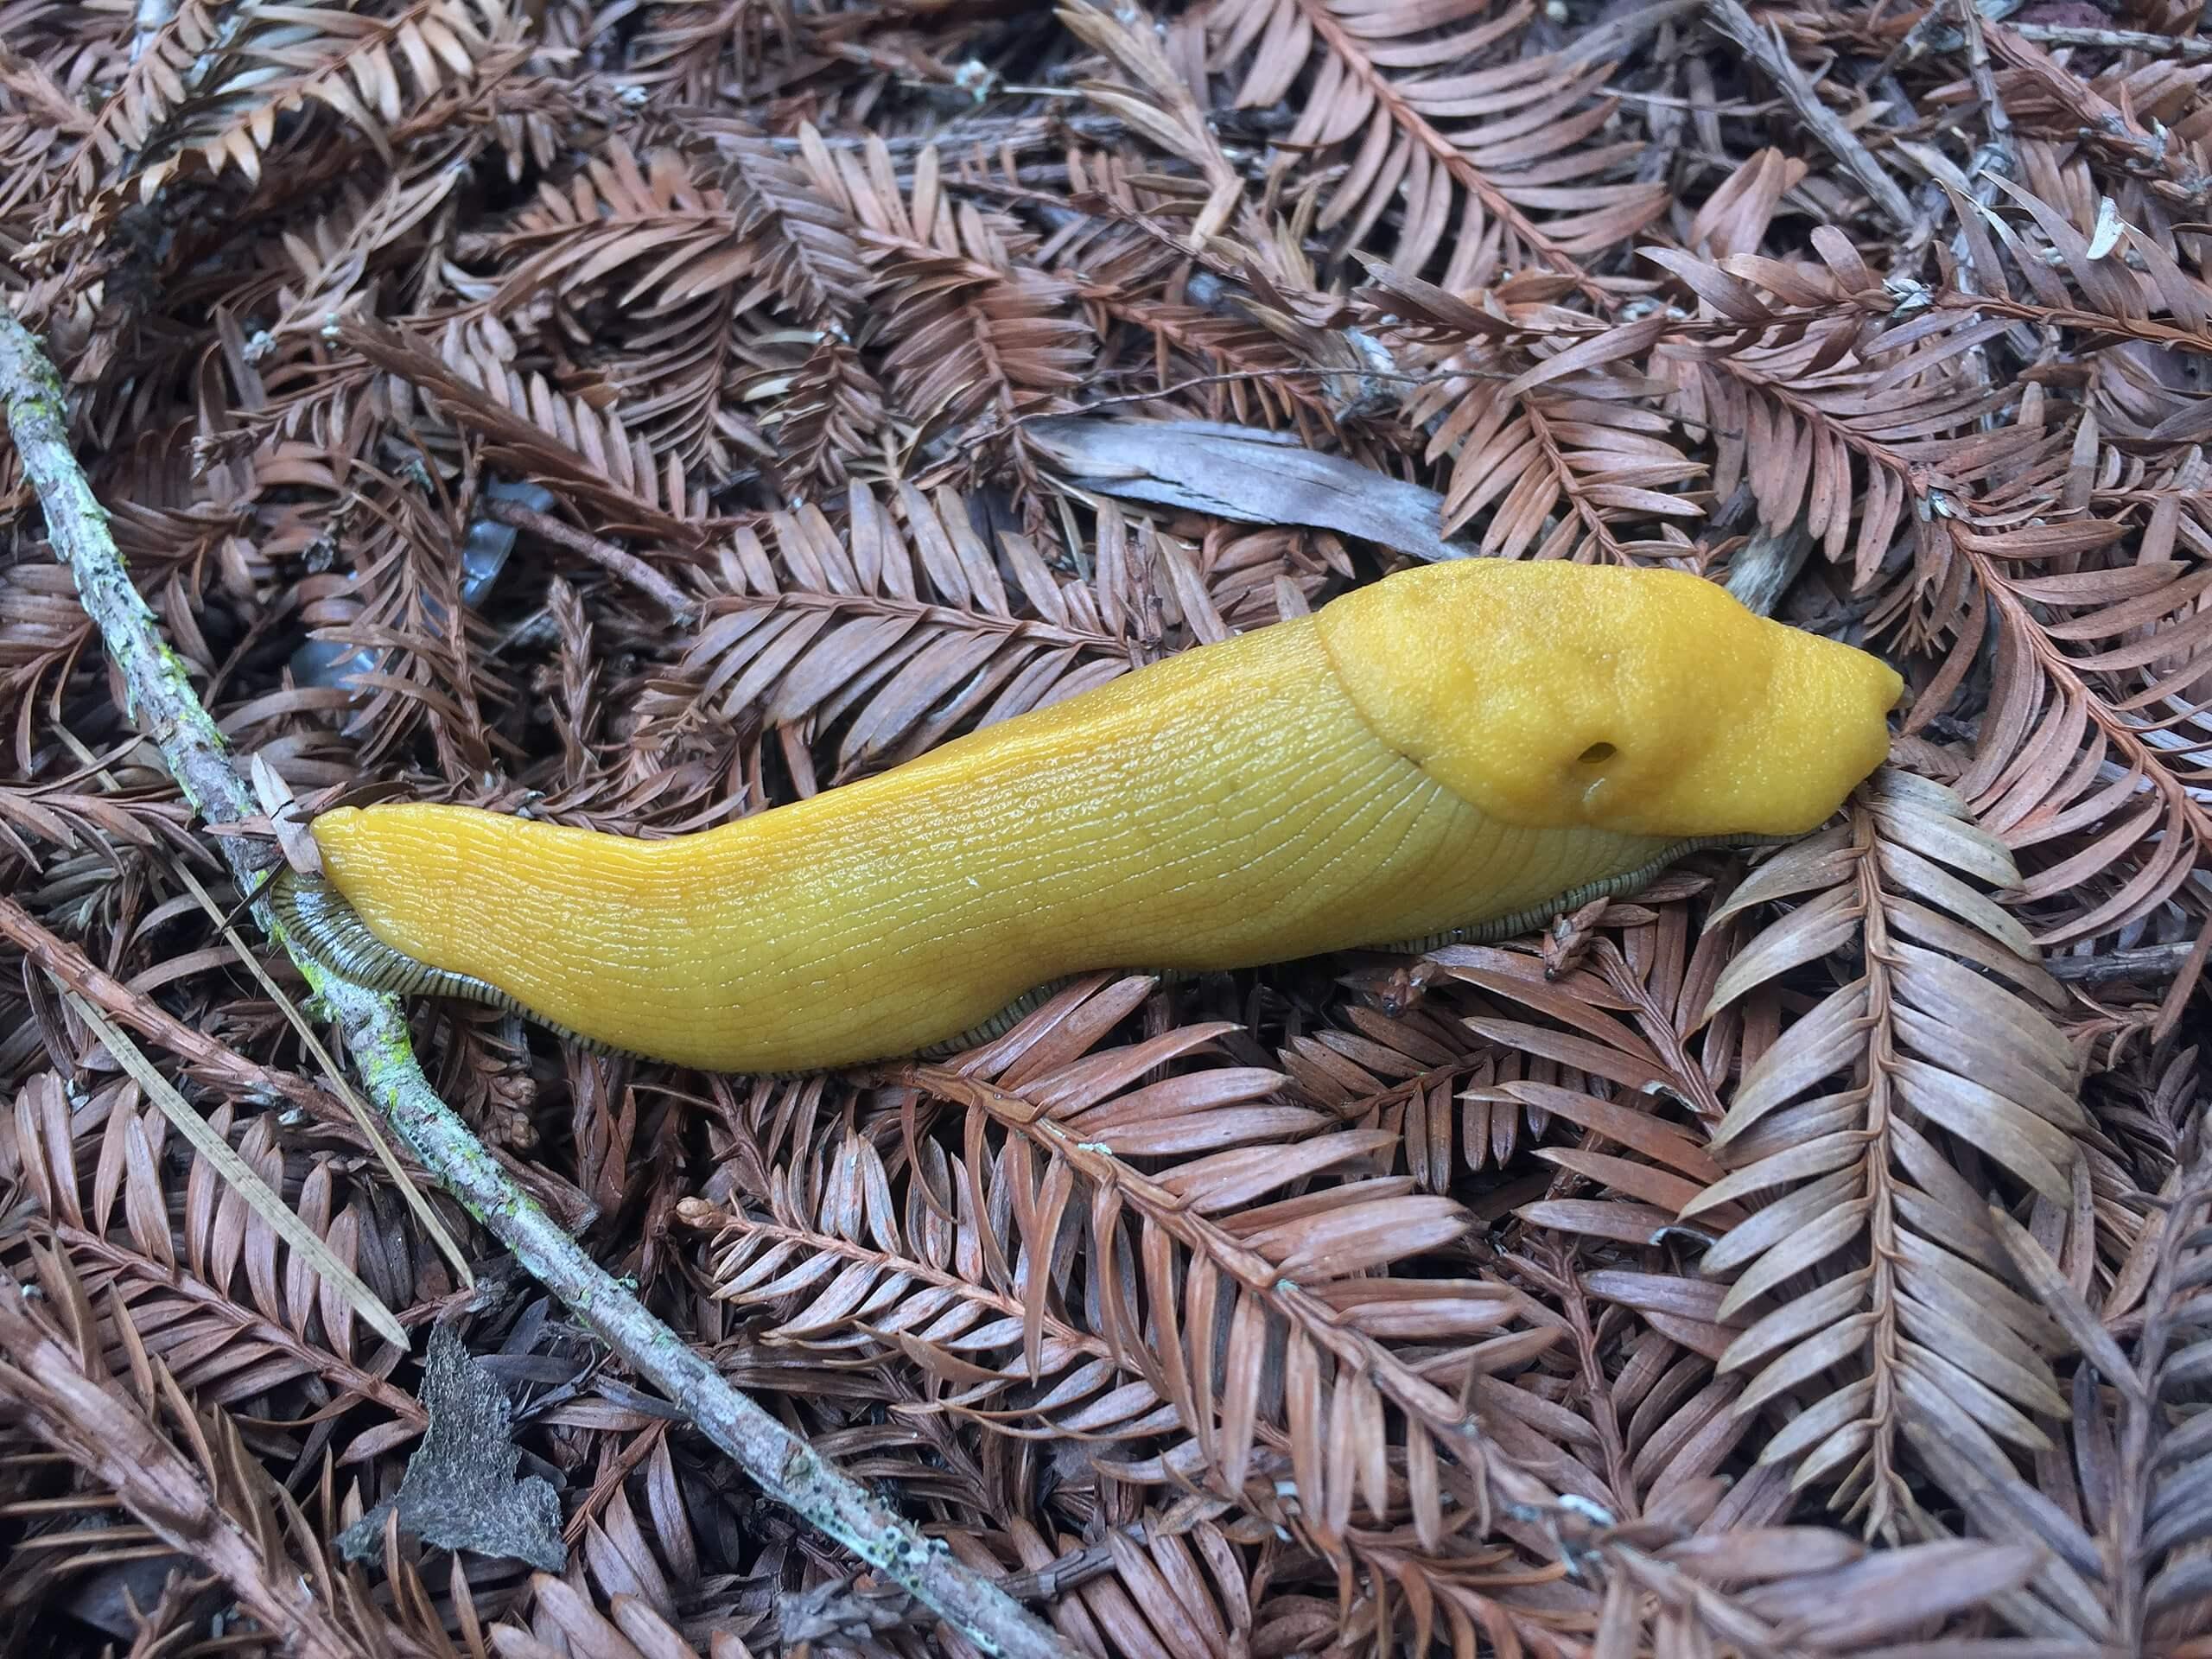 The California Banana Slug